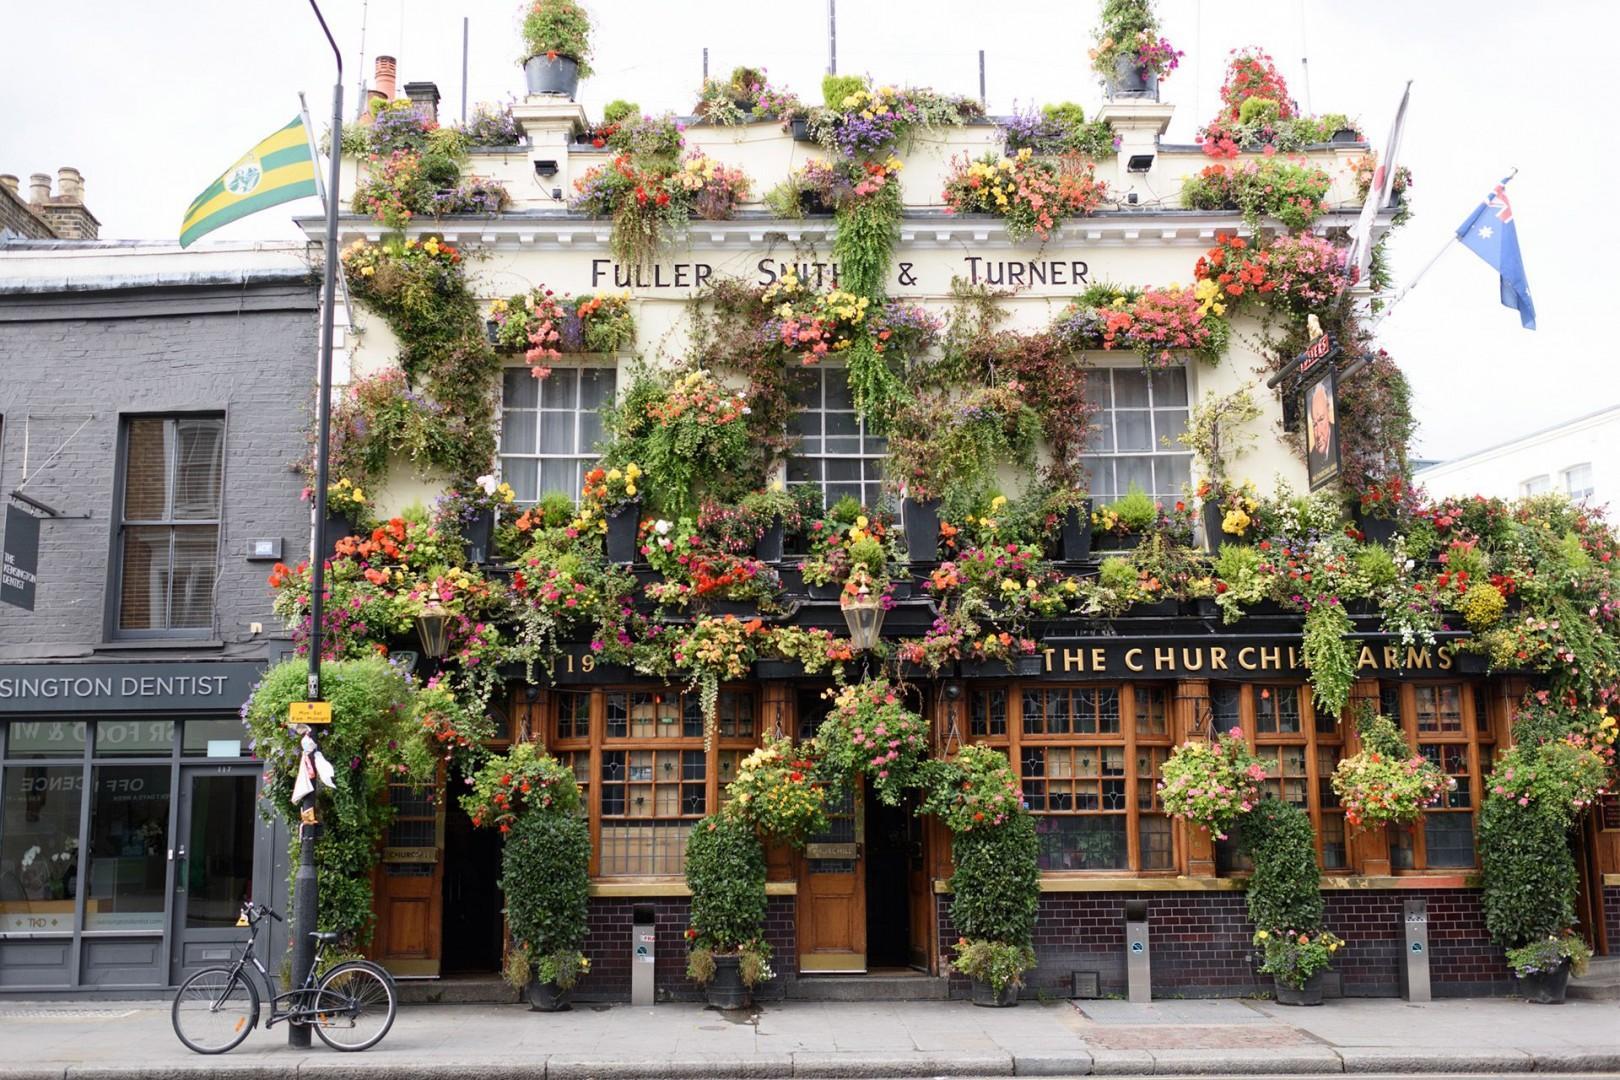 CMS-43-(Iconic London pub)-388112294-1533214440-GL-pub-churchill-arms-kensington-church-street-london-1